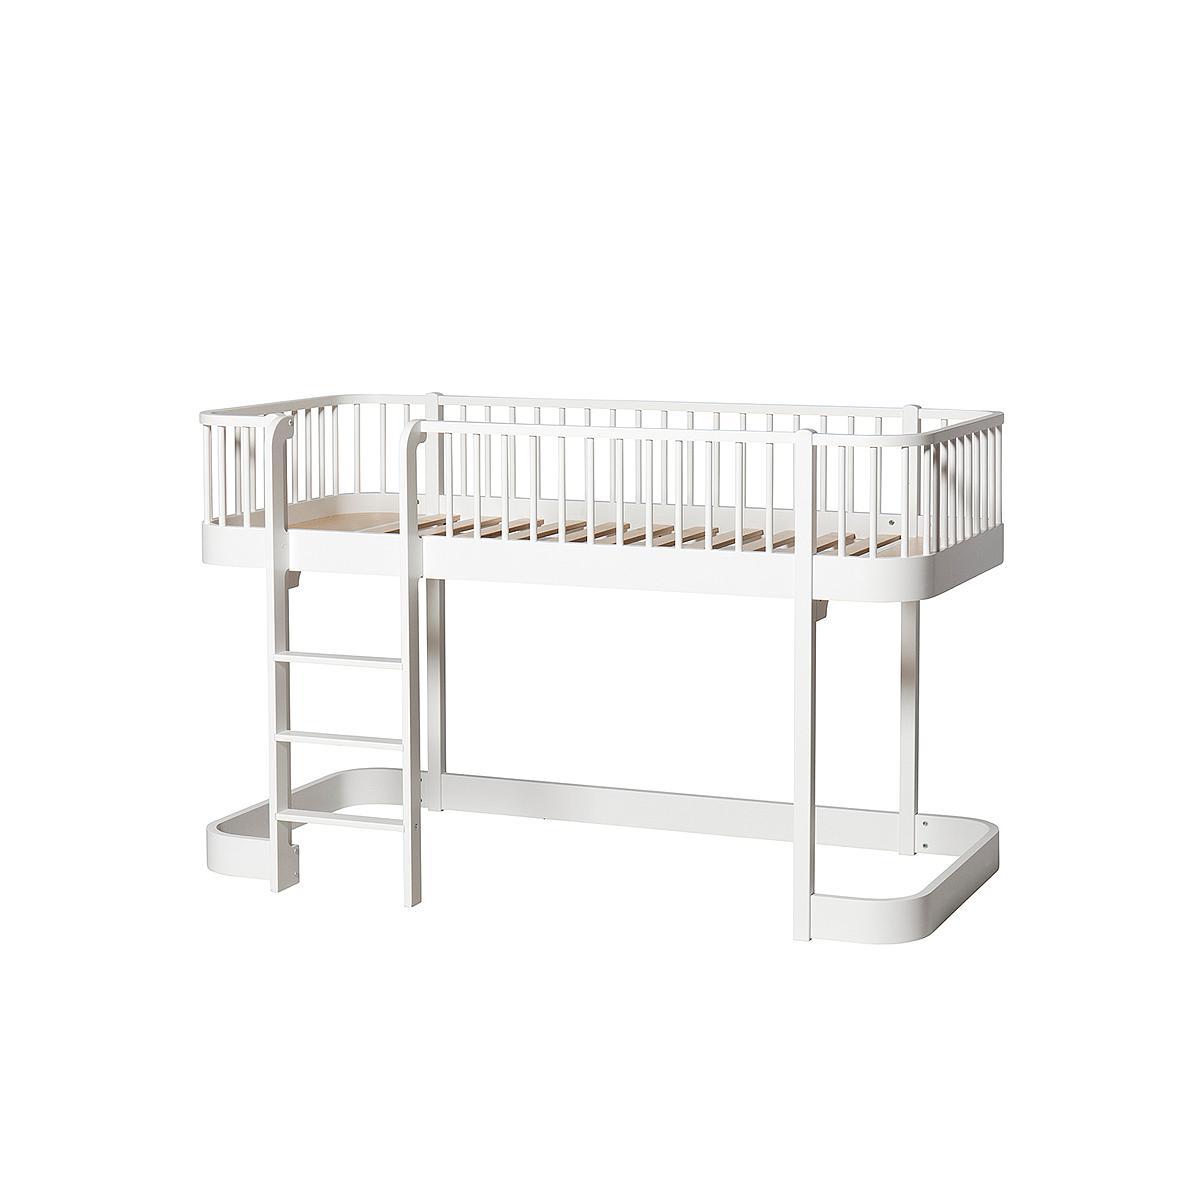 Cama evolutiva media alta 90x200cm WOOD ORIGINAL Oliver Furniture blanco